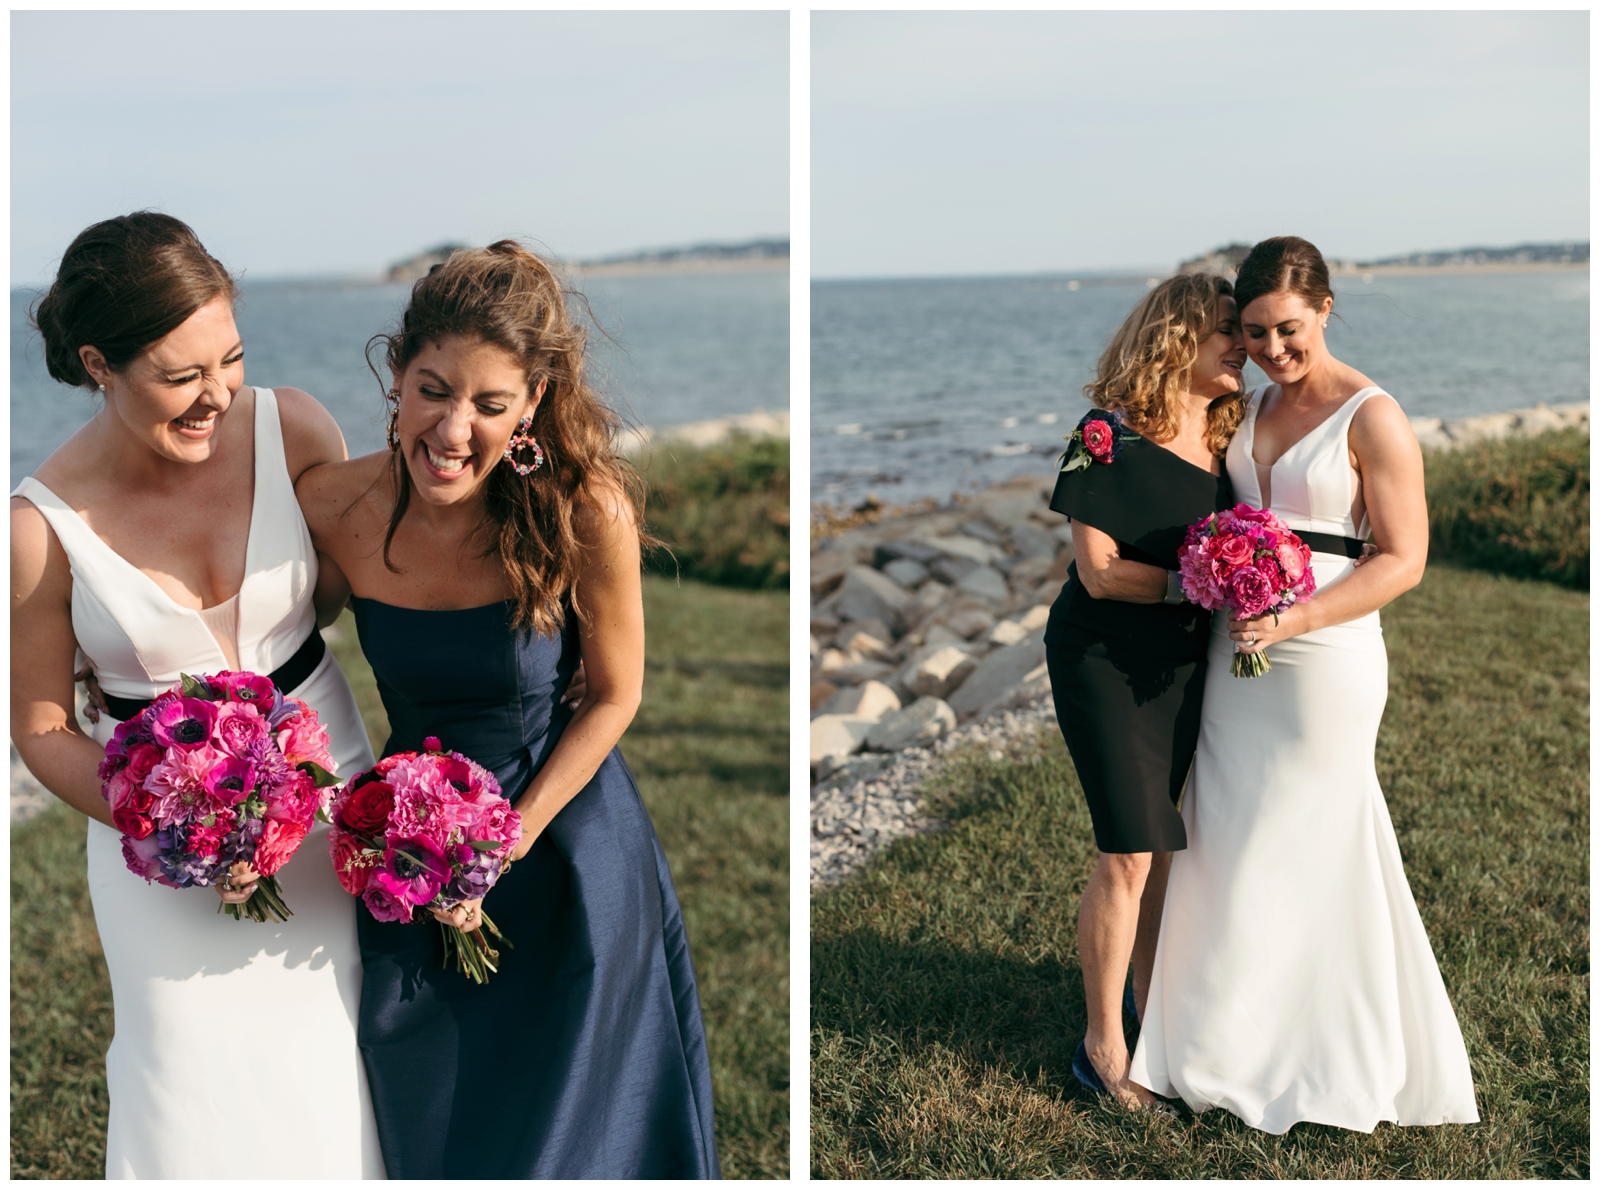 Bailey-Q-Photo-Backyard-Wedding-South-Shore-Boston-Wedding-Photographer-068.jpg